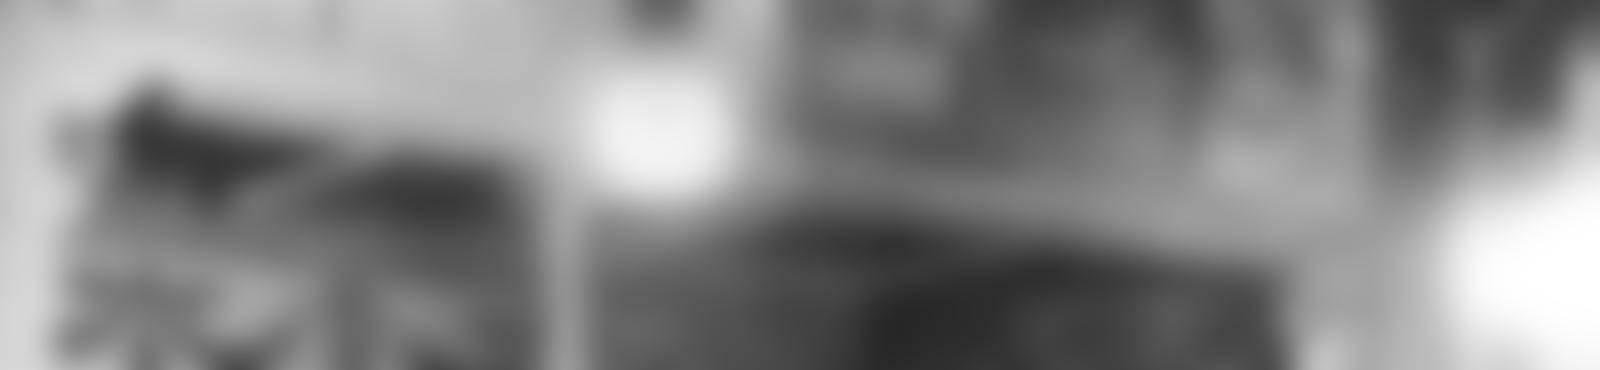 Blurred comiquetheatre web